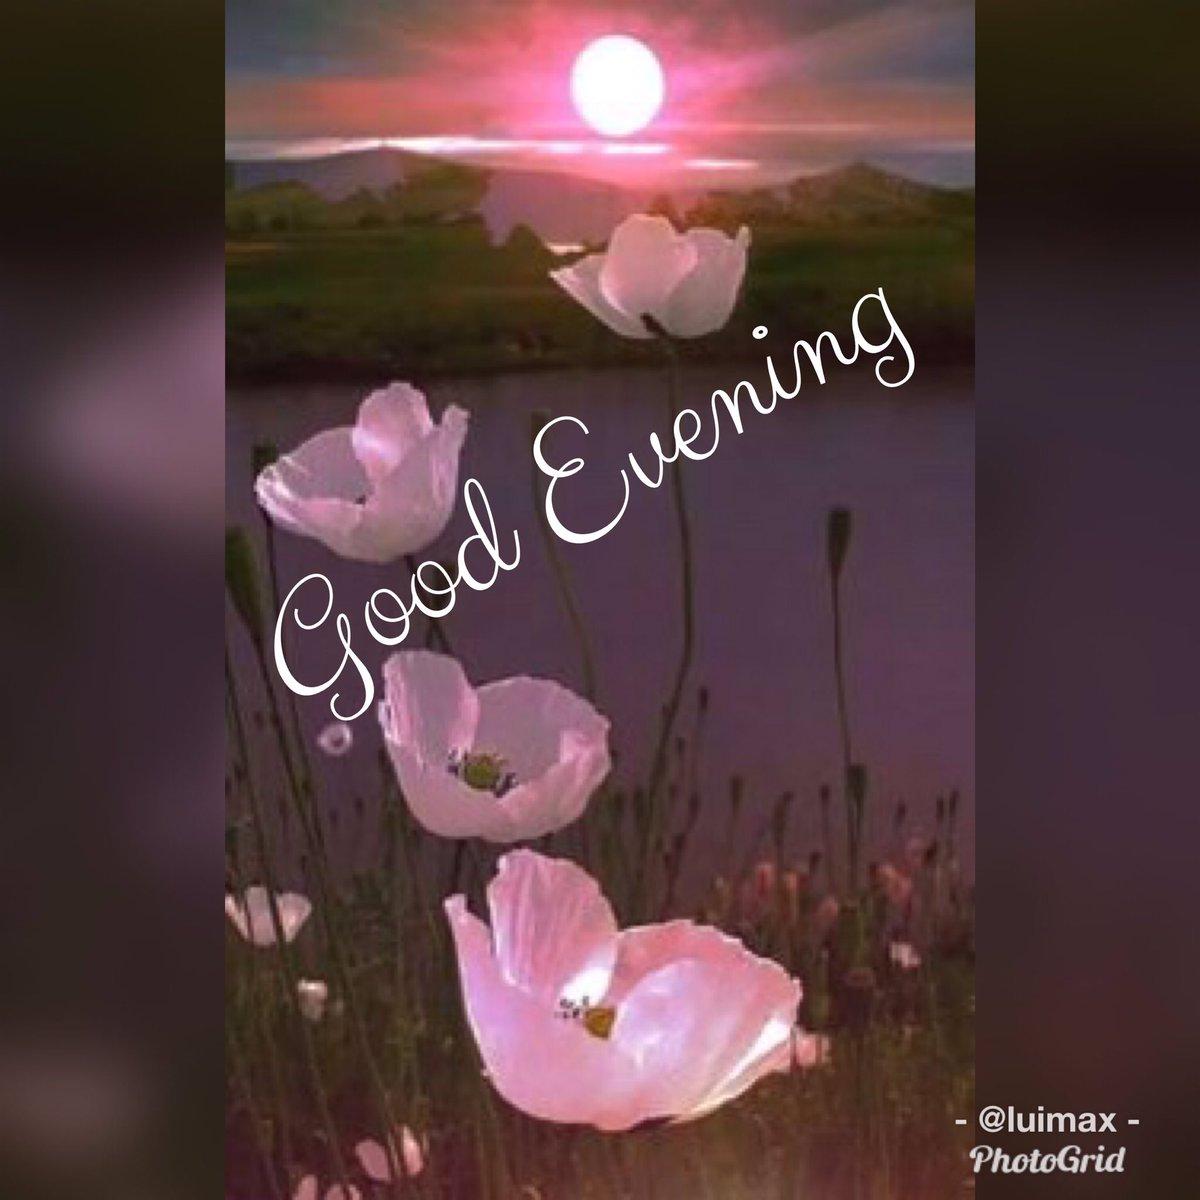 Yours On Twitter Good Morning Sis Luimaxm16 Blessed Tuesday Aldubnationholdingon Https T Co Jwi5oydcaq